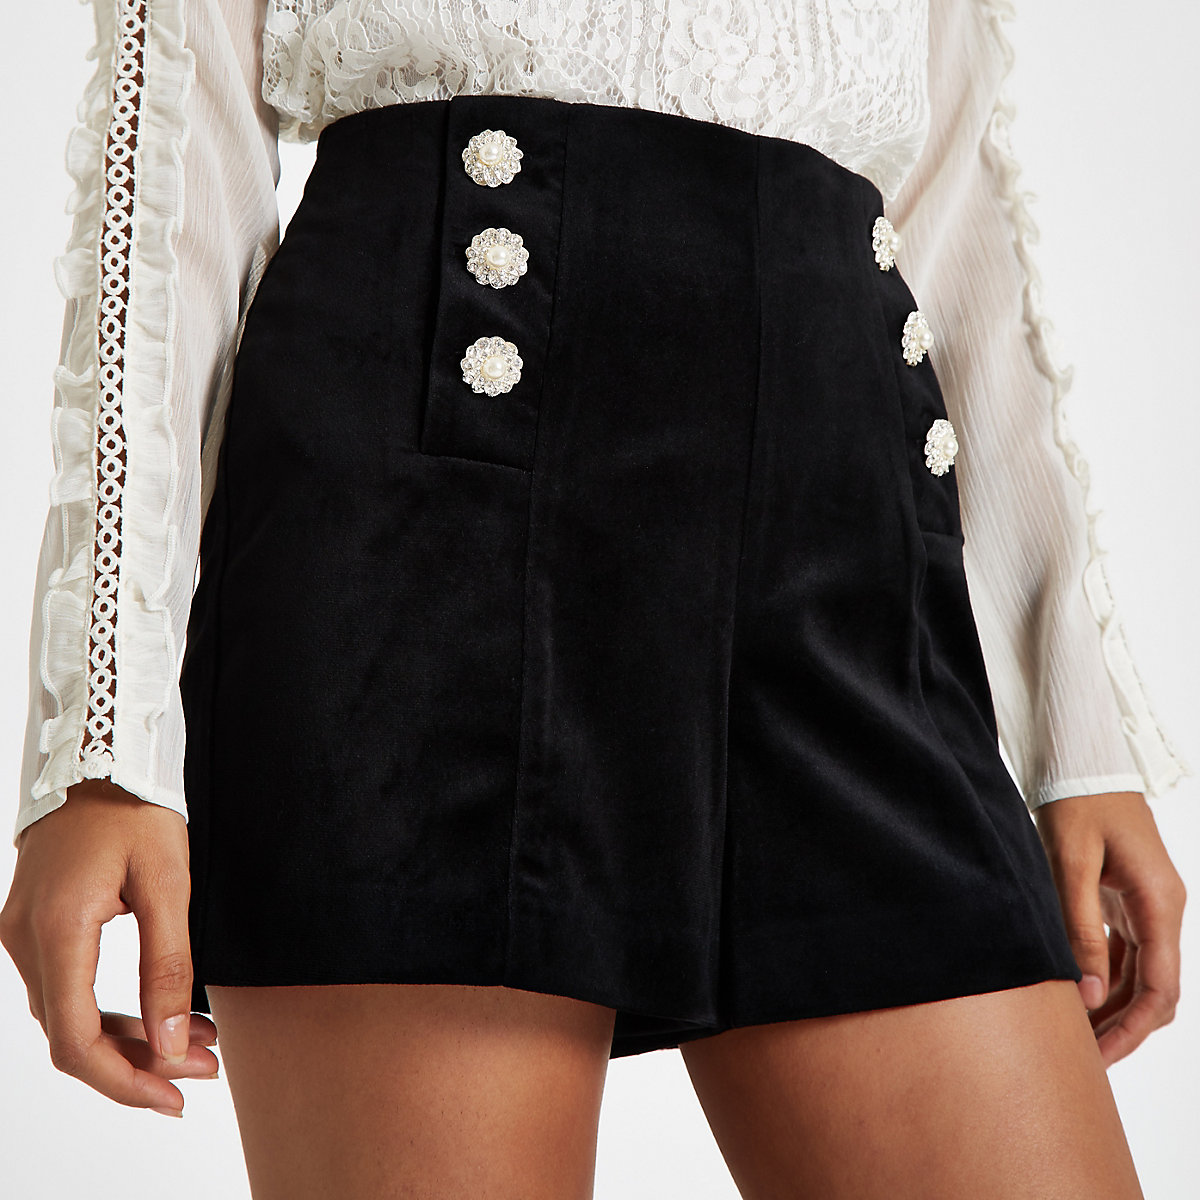 Petite black velvet embellished shorts